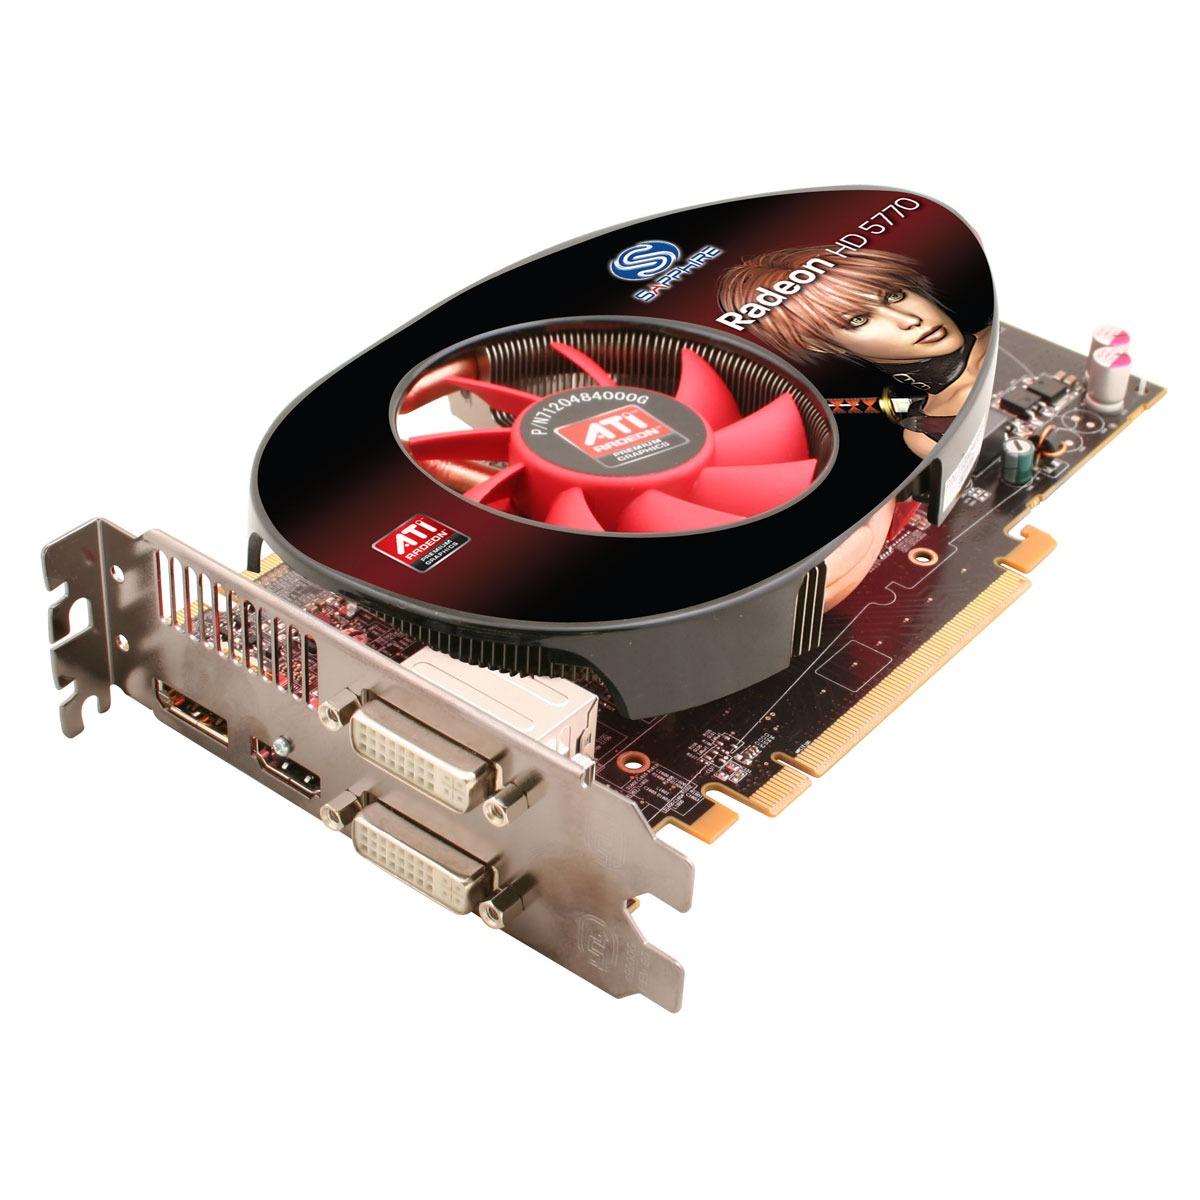 بيع Asus P5Q Pro , Ram OCZ, HD 5770, DD Seagate